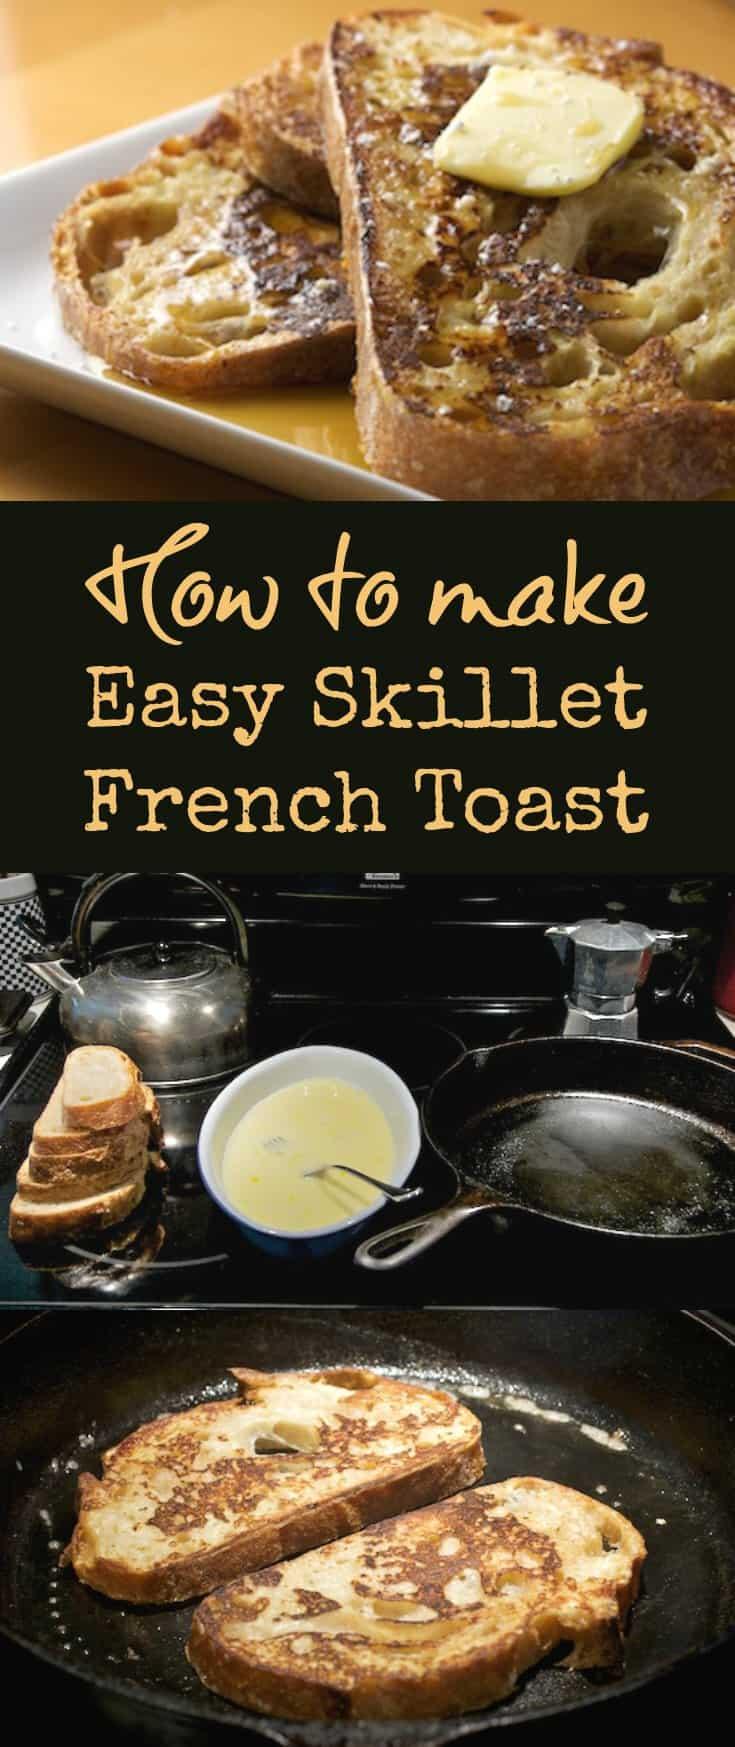 Easy French Toast Recipe | pinchmysalt.com